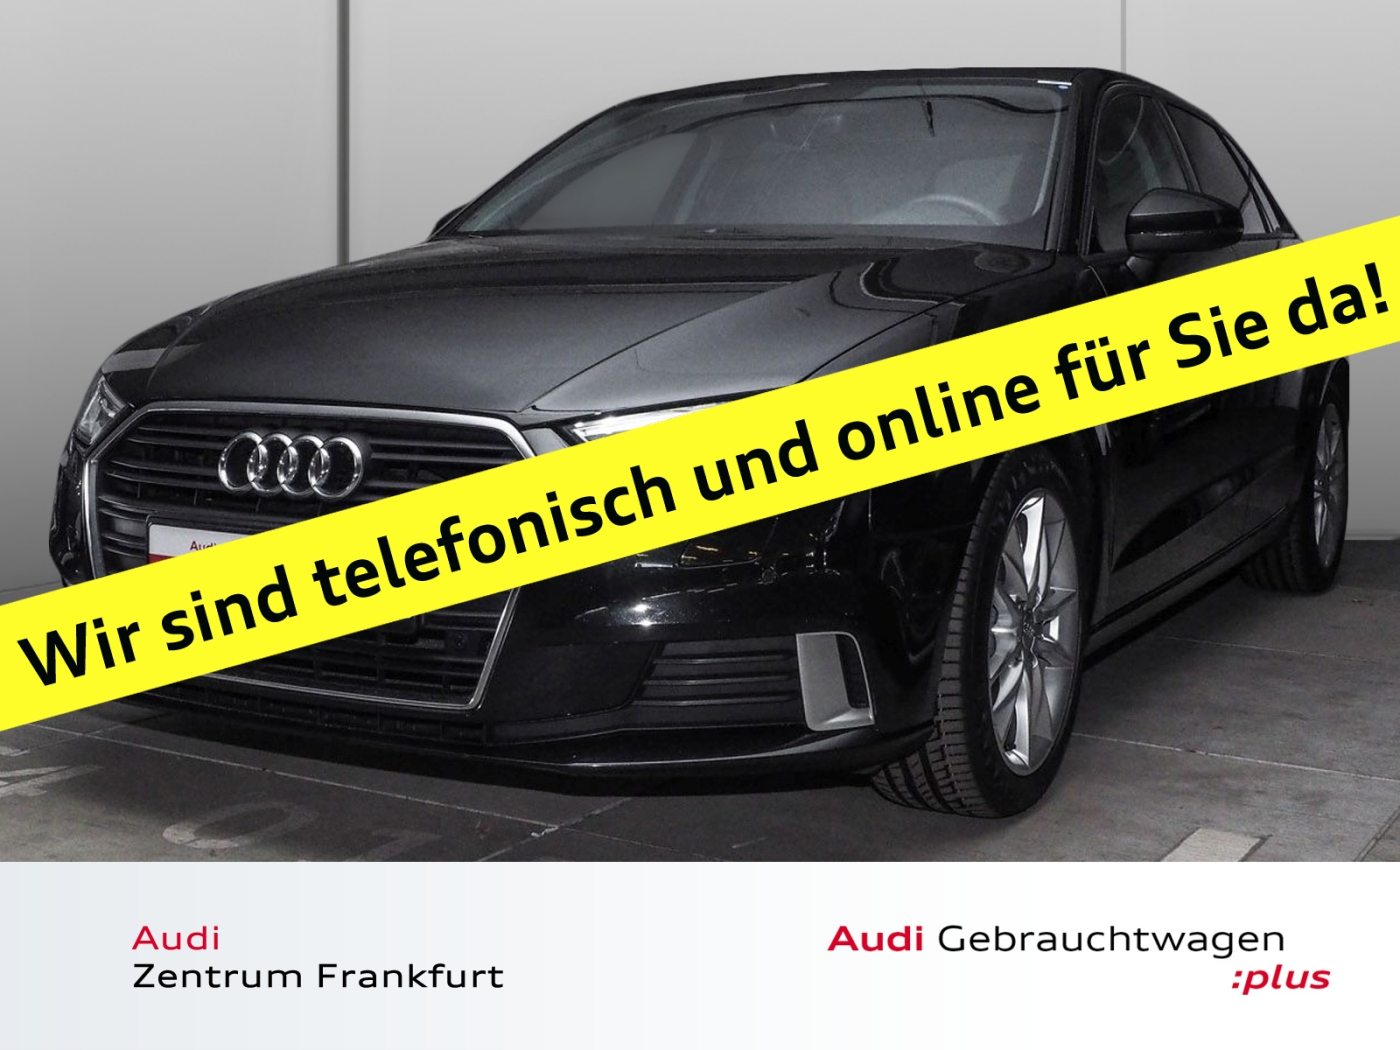 Audi A3 Sportback 2.0 TDI S tronic sport Navi Virtual, Jahr 2017, Diesel